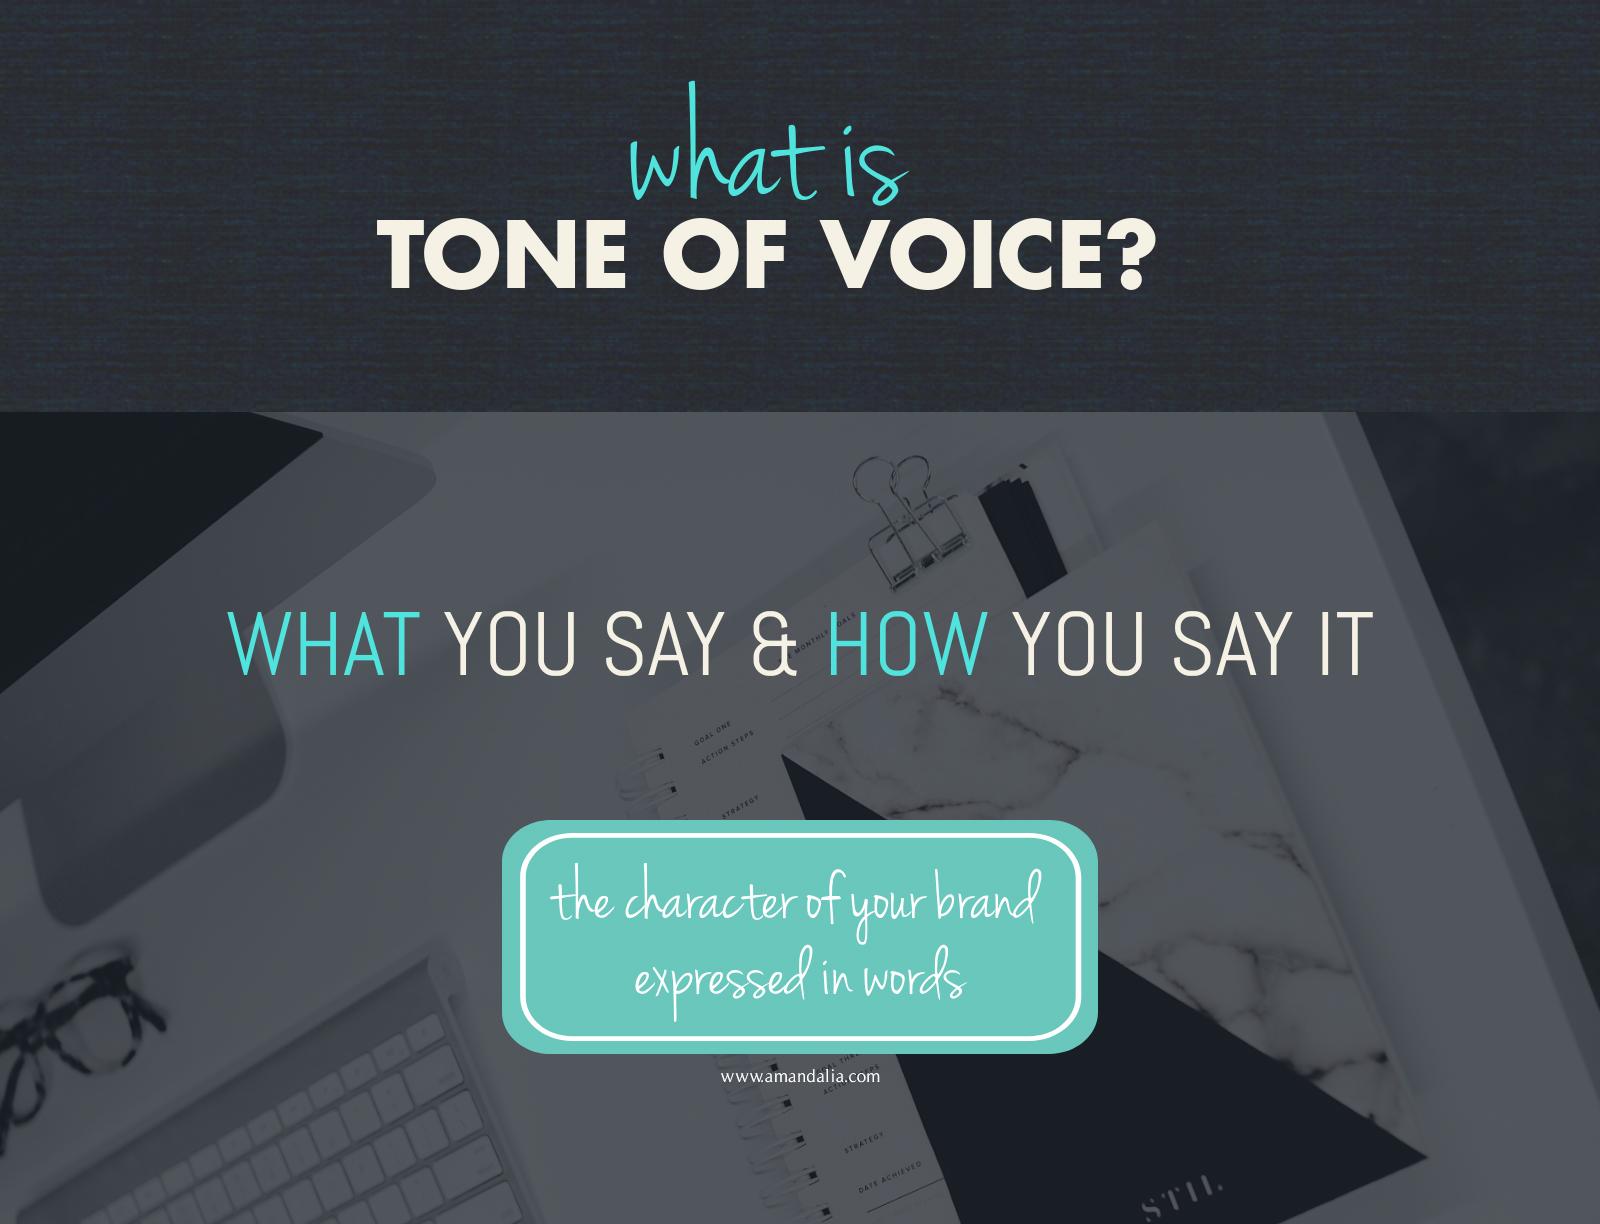 toneofvoice-byamandalia